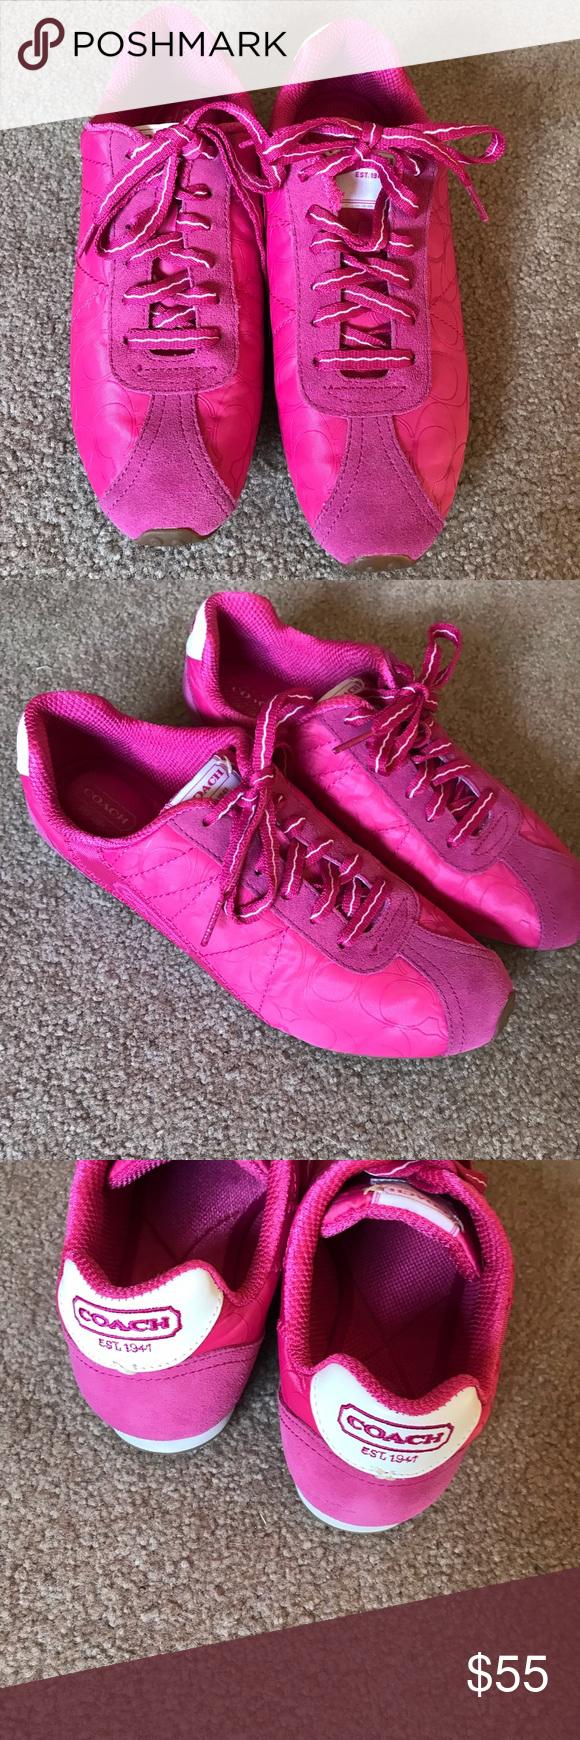 Coach Women's Pink Sneakers Rae F0007